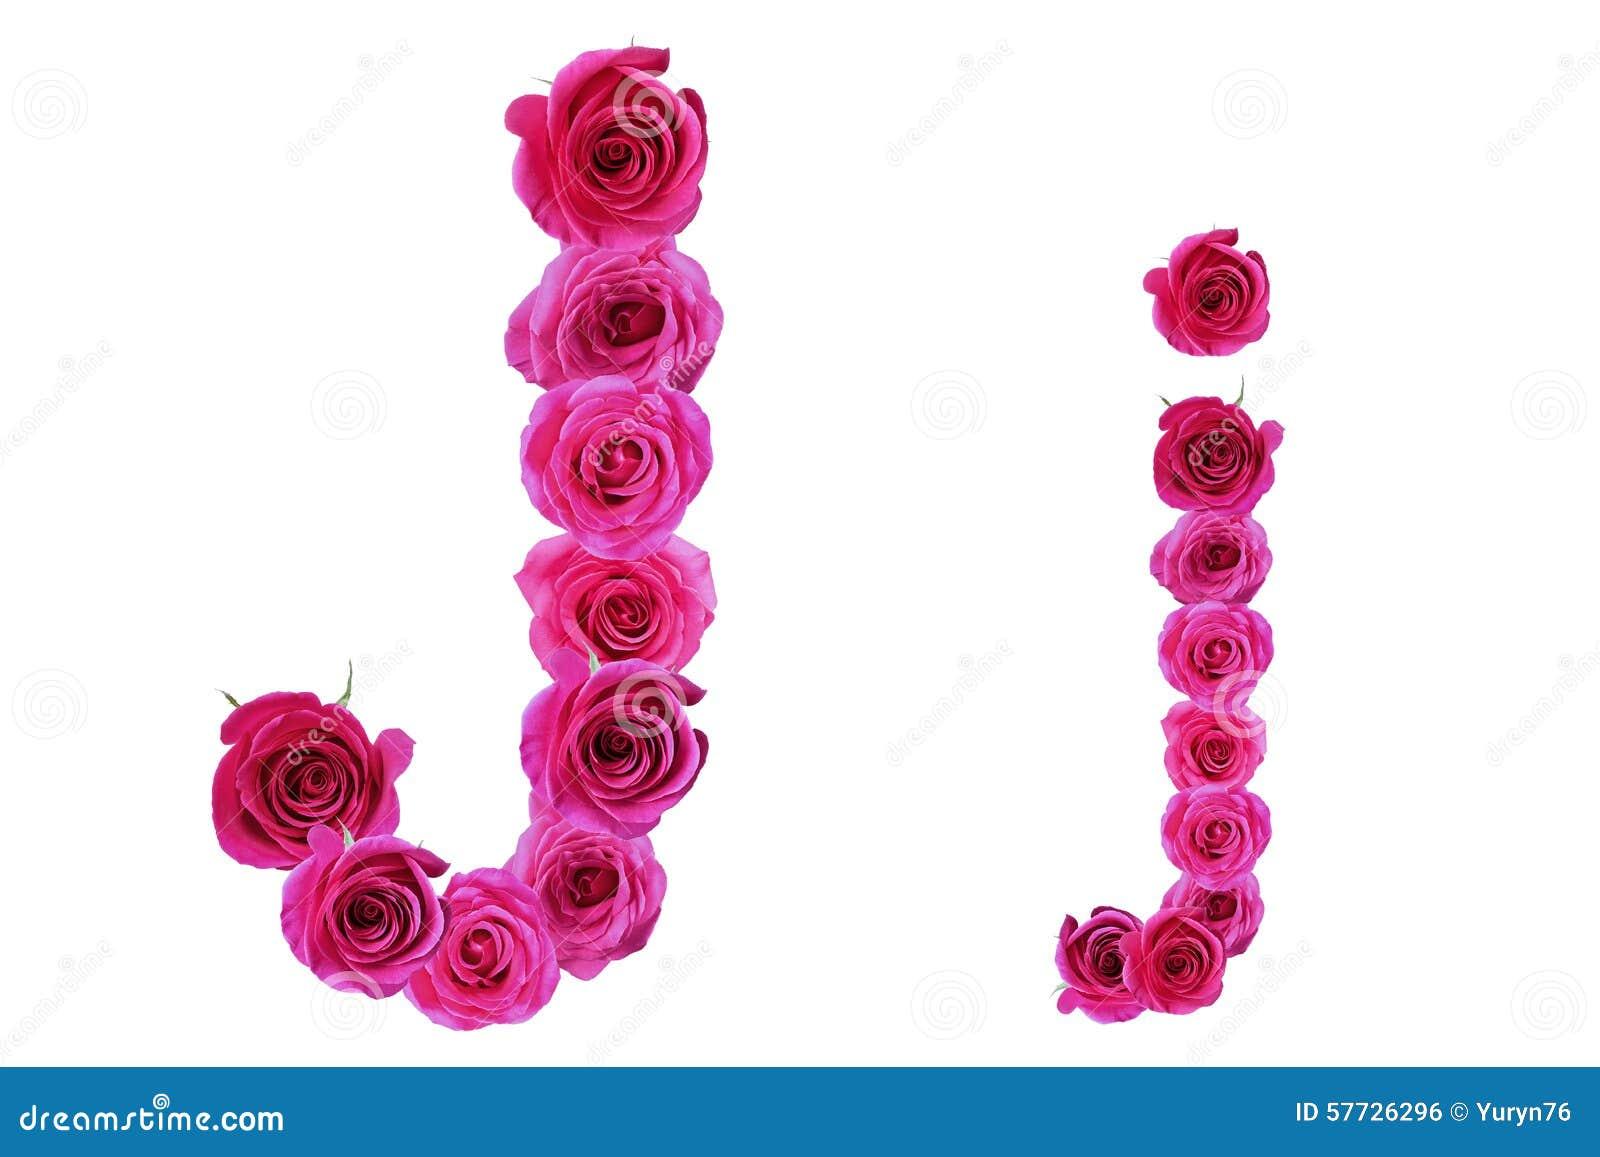 Letter J Of Rosesalphabet Flower Season Rose Plant Symbol Style Text Nature Floral Foliage Flora Natural Abc Letters Organic Set Leaf